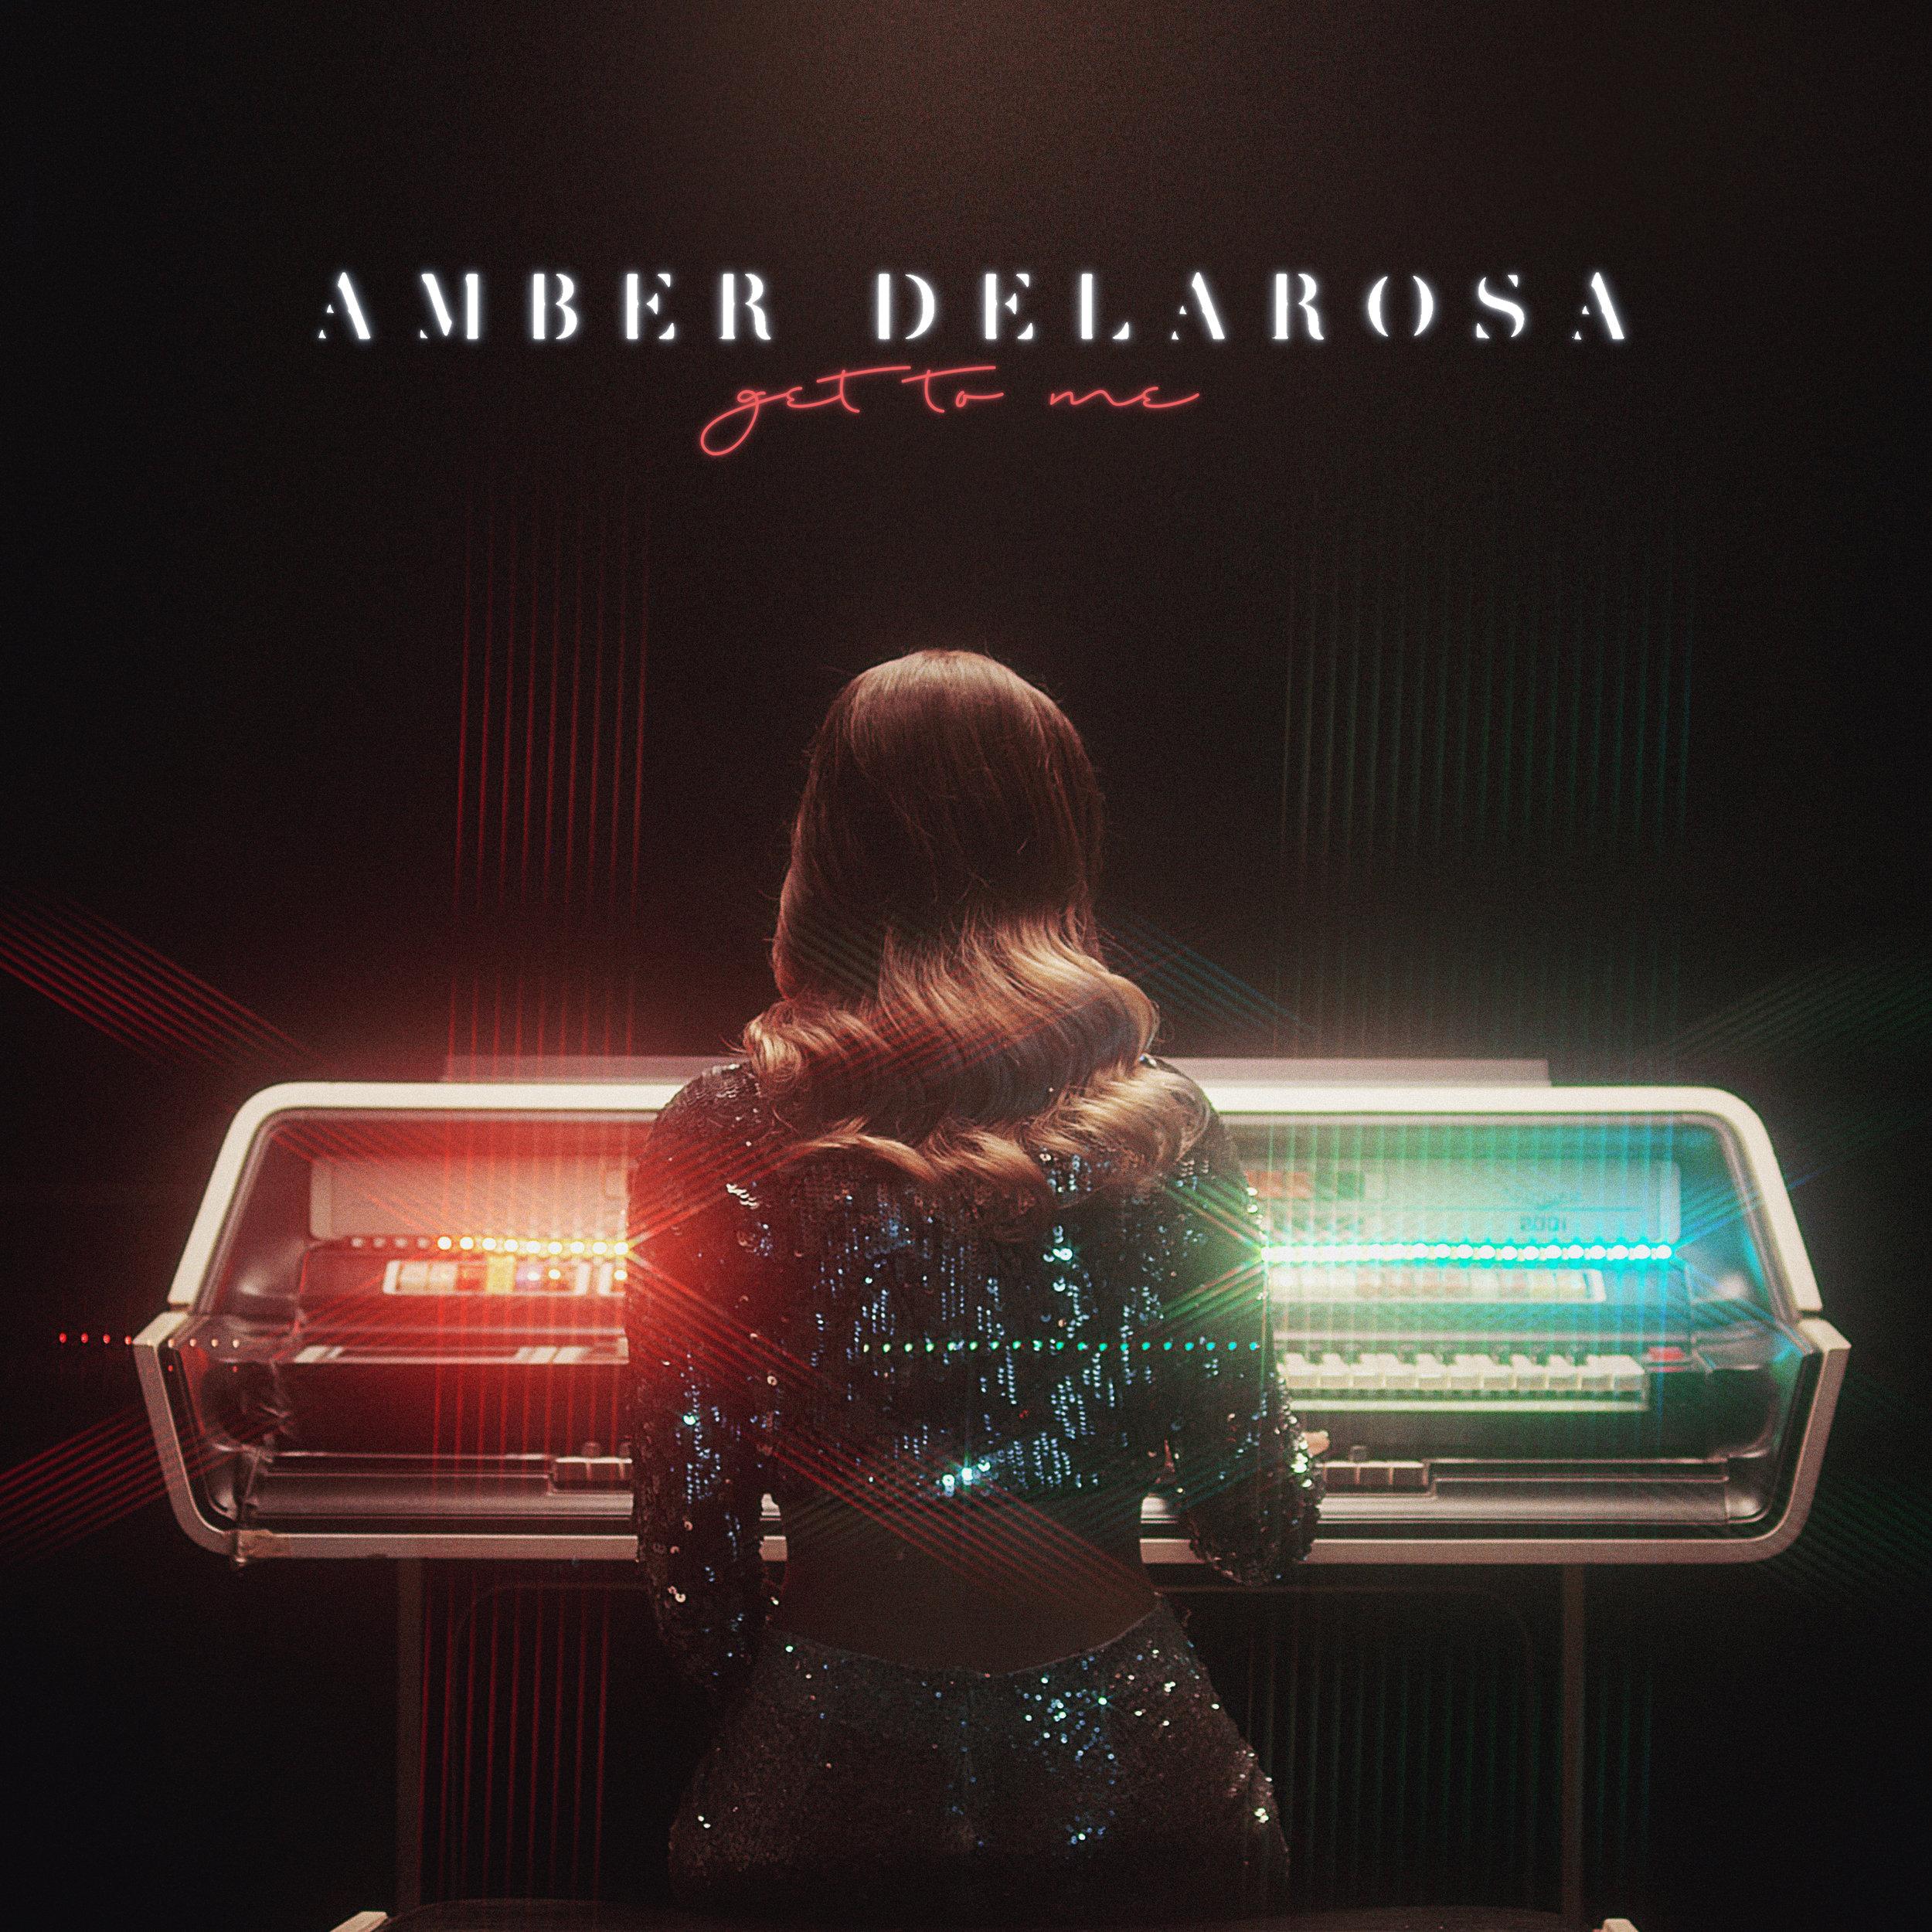 AmberDeLaRosa-GetToMe-FINALcover.jpg